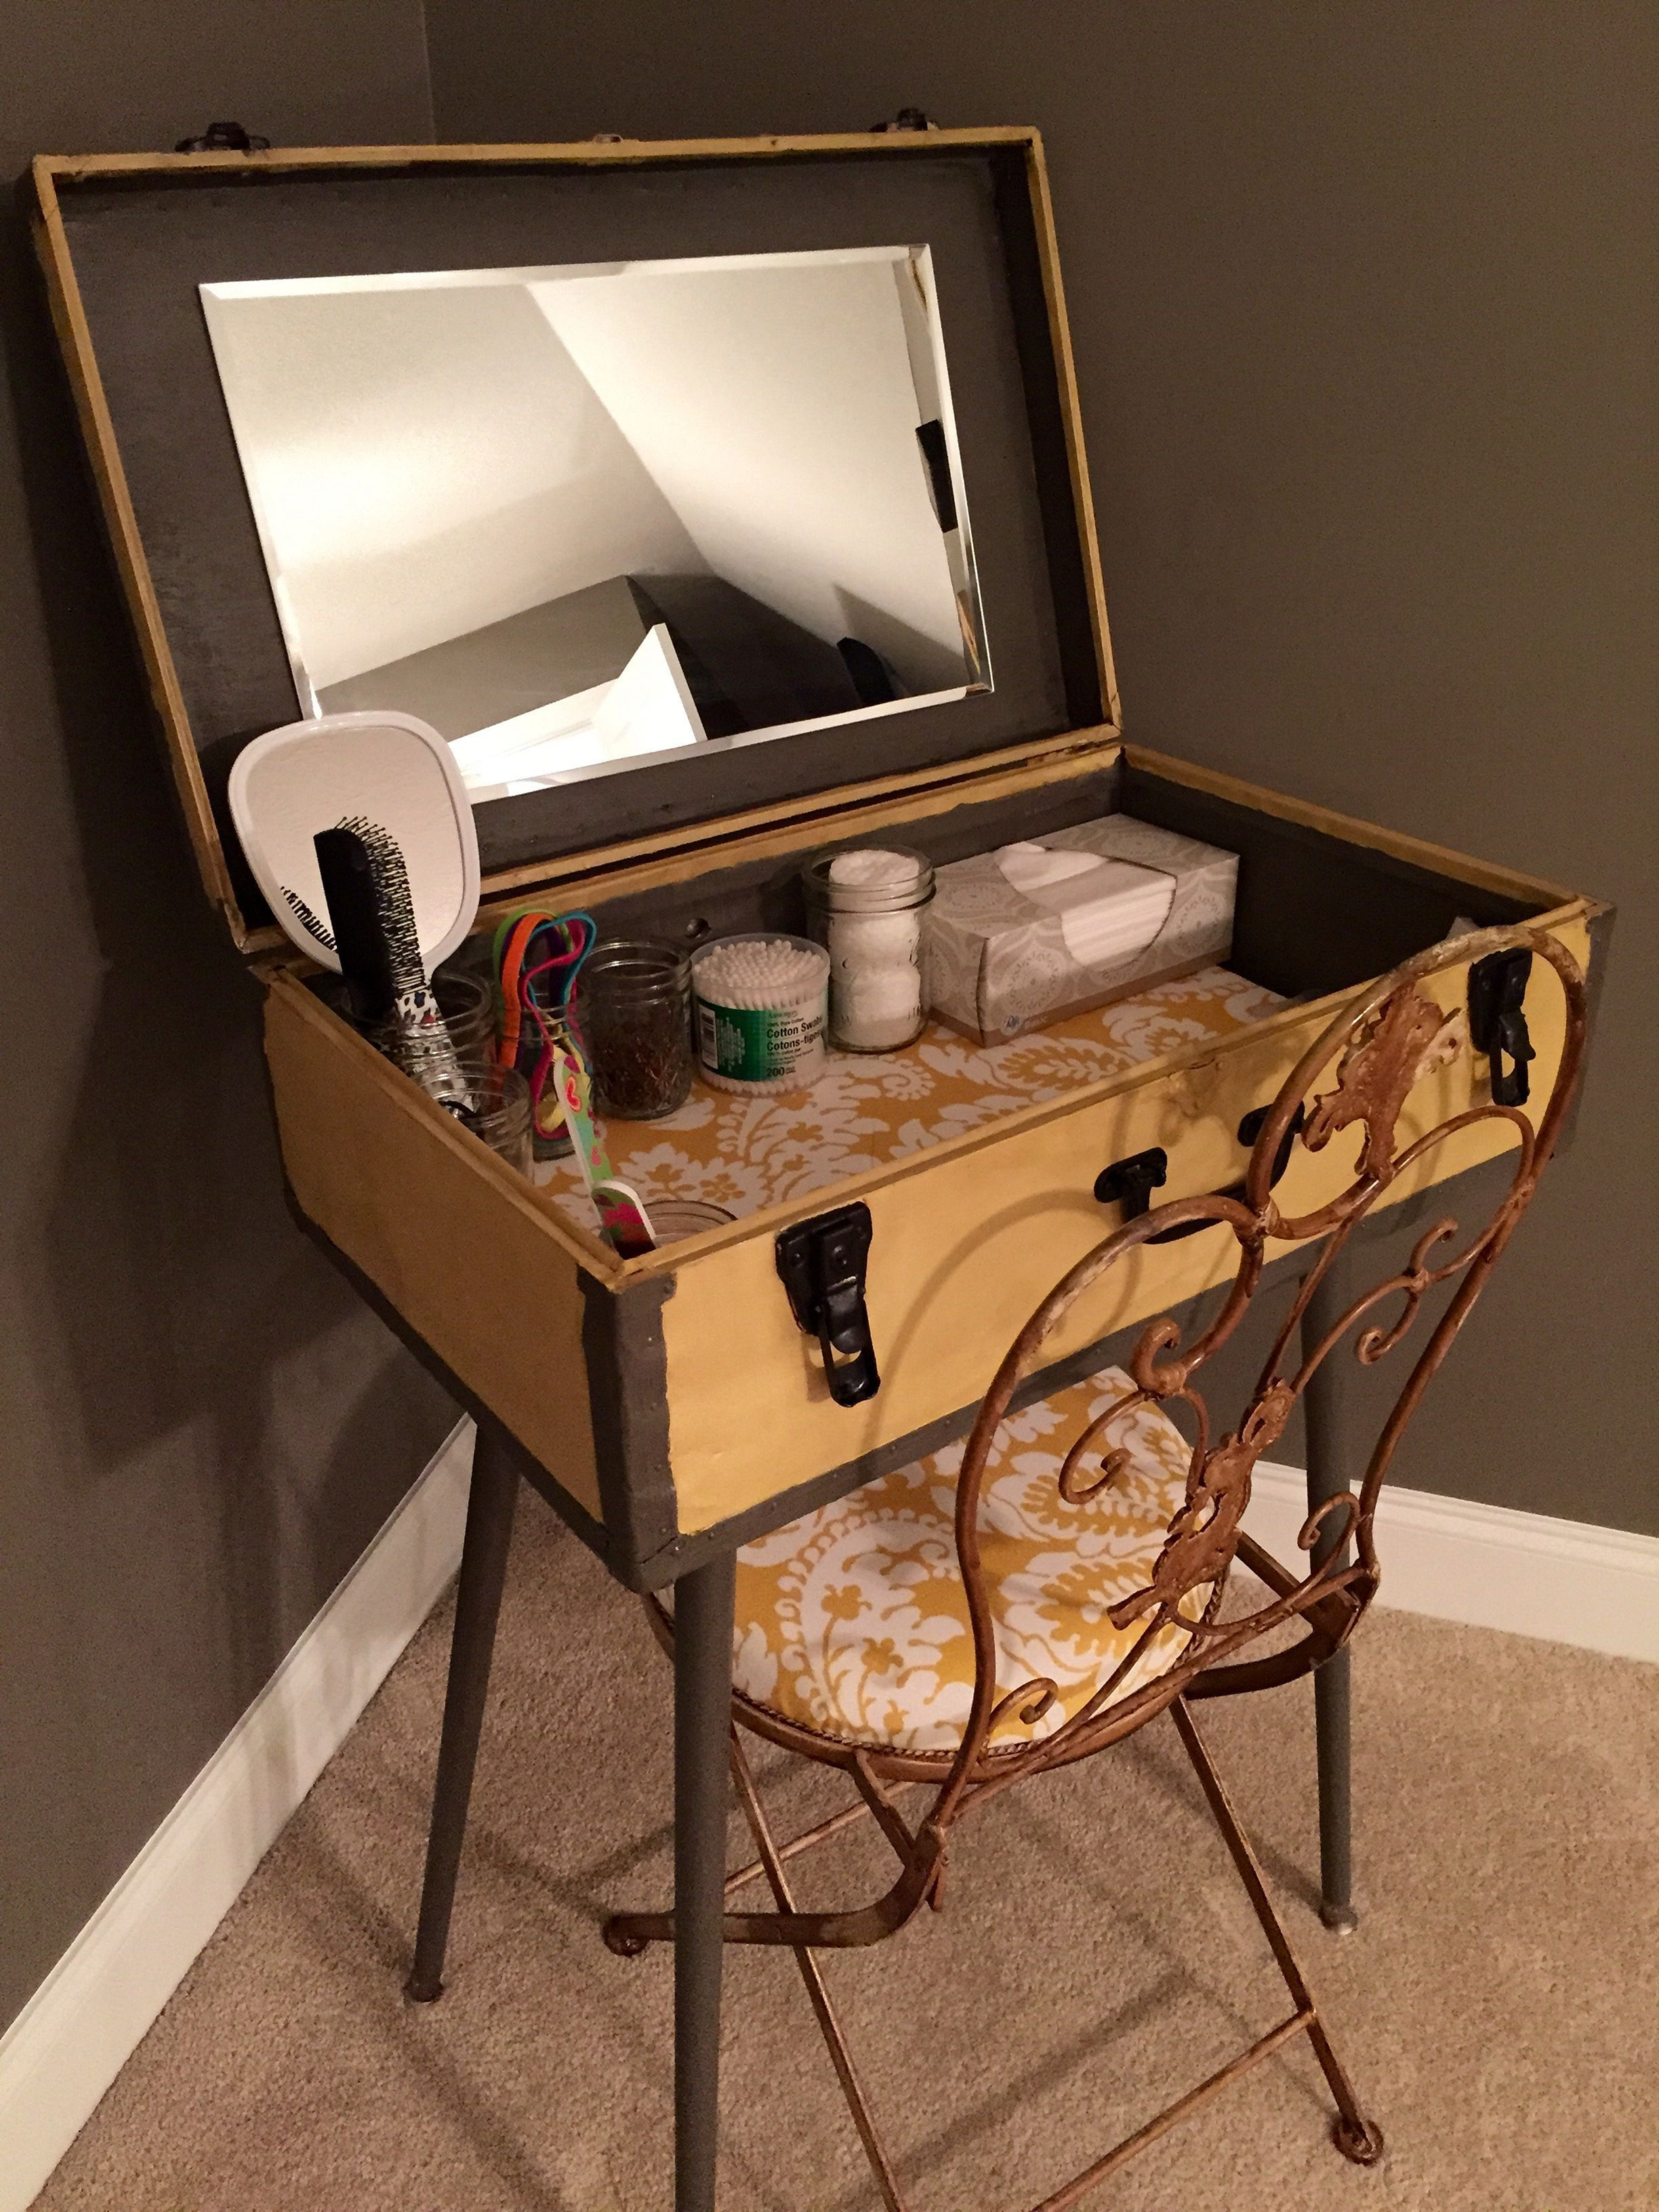 30 Fabulous Diy Decorating Ideas With Repurposed Old Suitcases: 30+ Amazing DIY Makeup Vanity Design Ideas That Can Inspire You / FresHOUZ.com